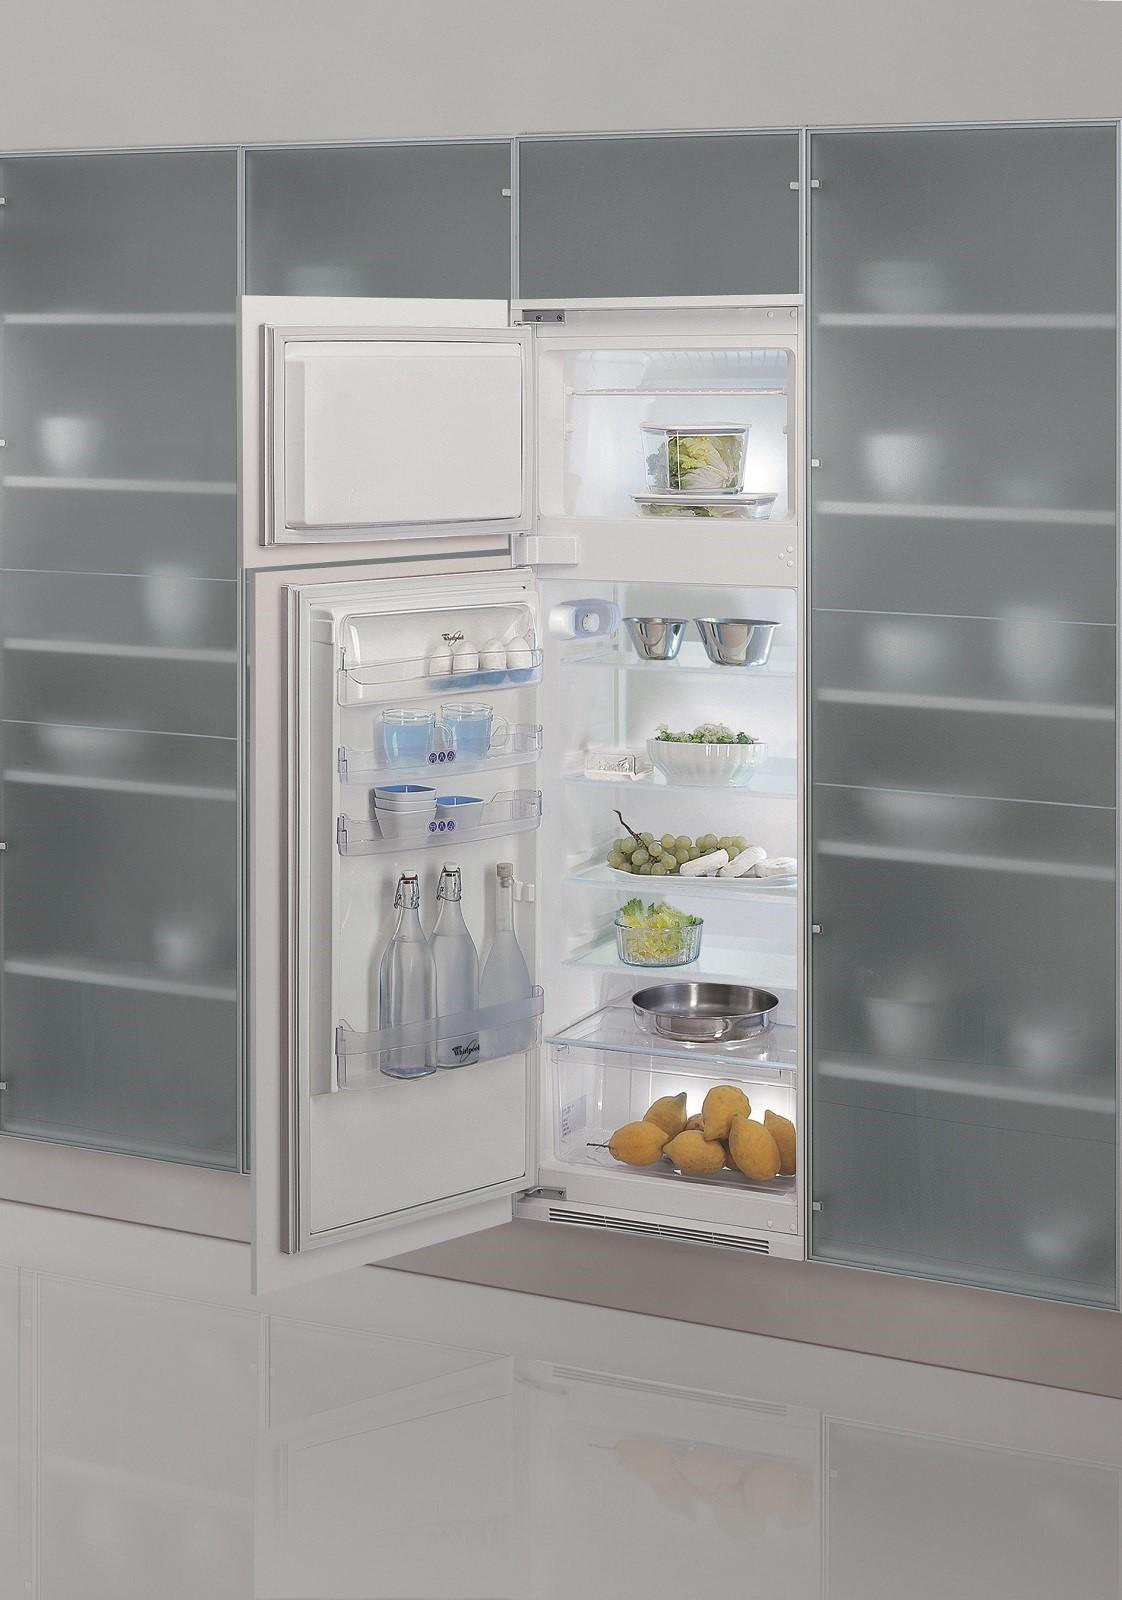 I comuni frigoriferi doppia porta da incasso per stivare - Frigoriferi a doppia porta ...